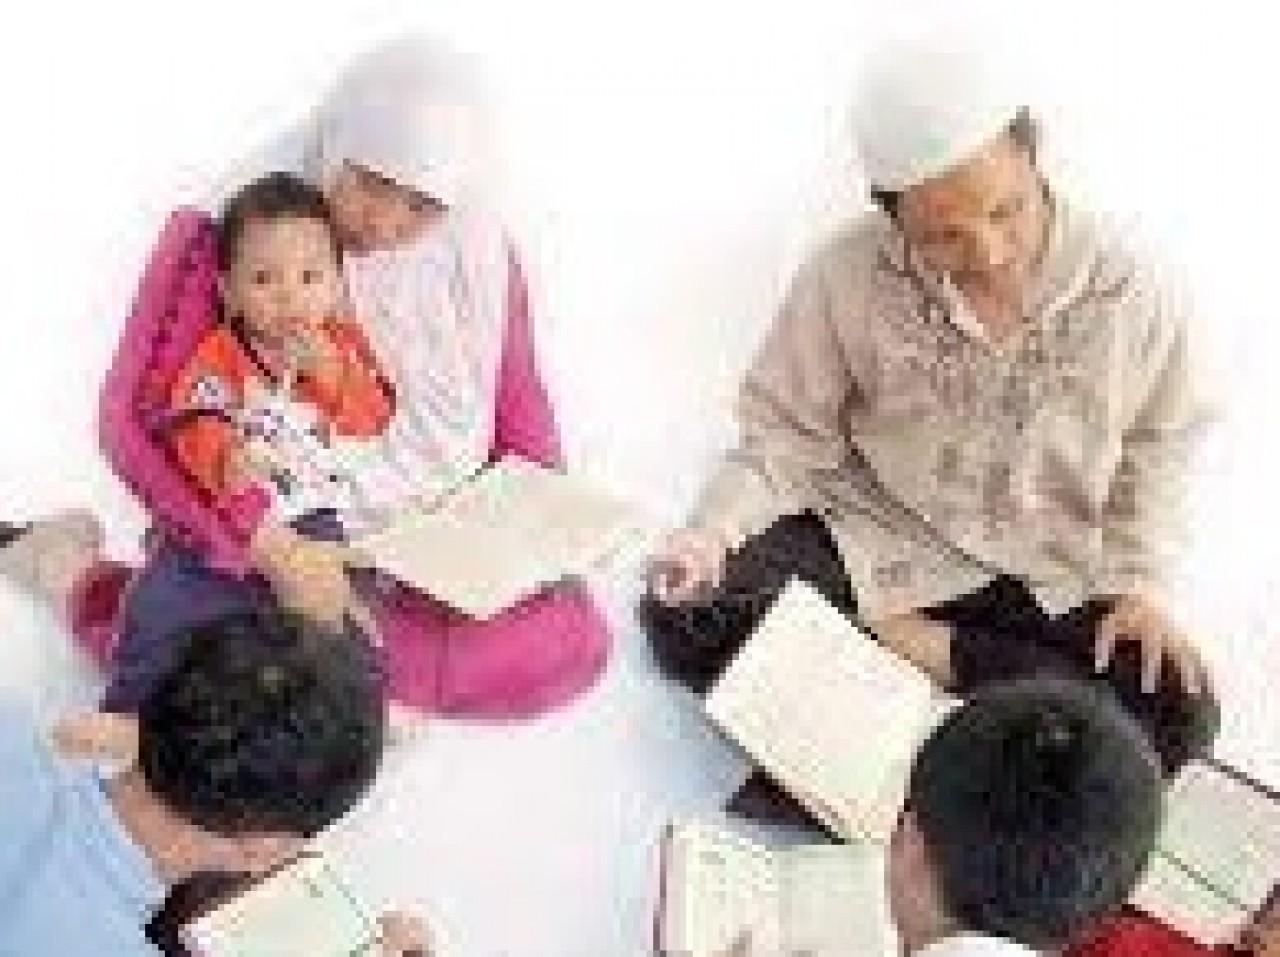 Lima Prinsip Parenting